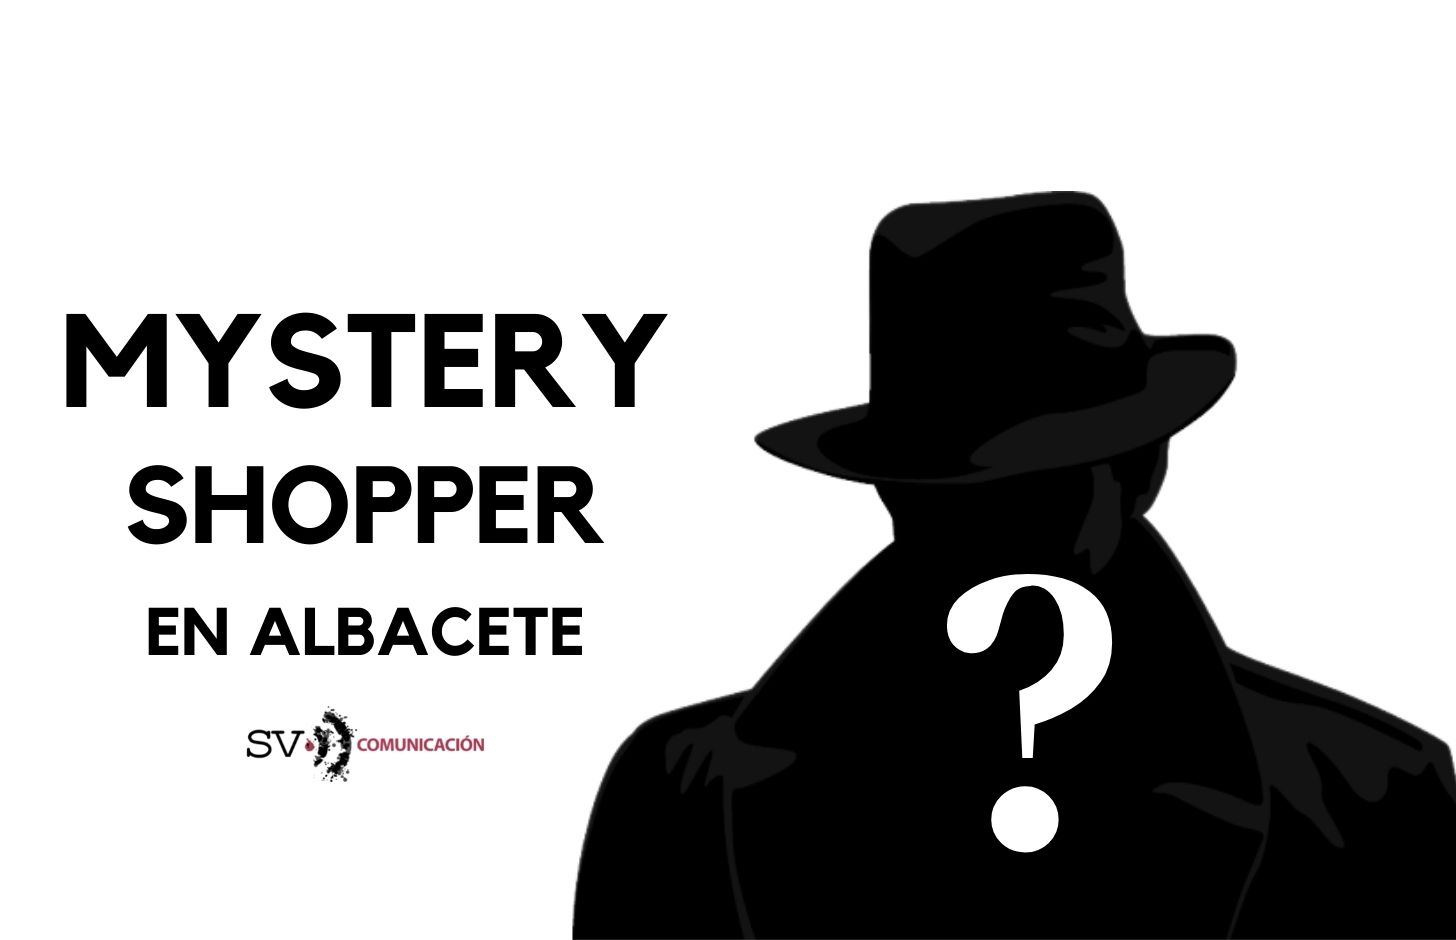 mystery shopper marketing albacete